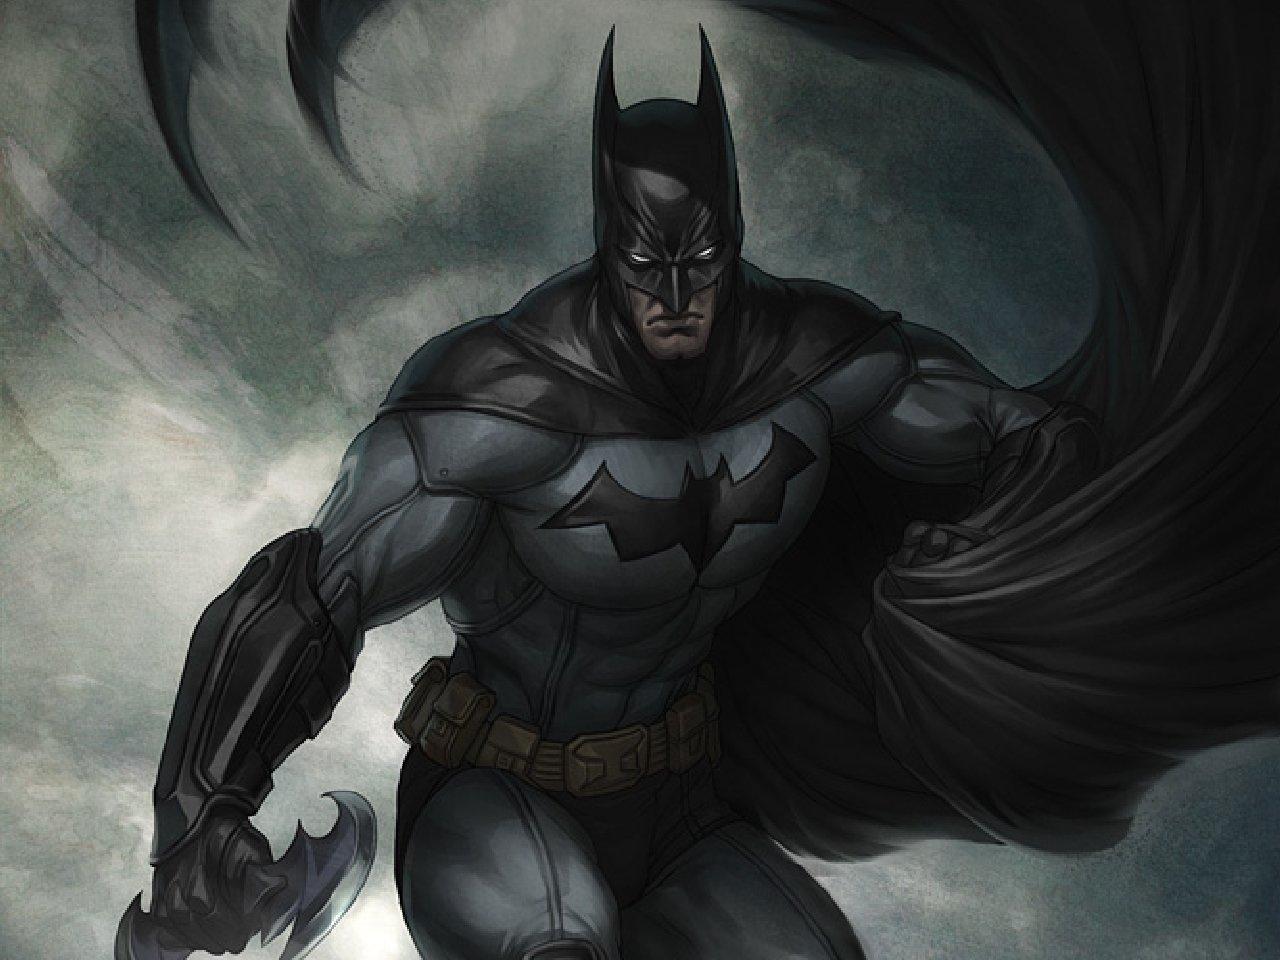 desktop wallpaper batman, batman pictures wallpapers